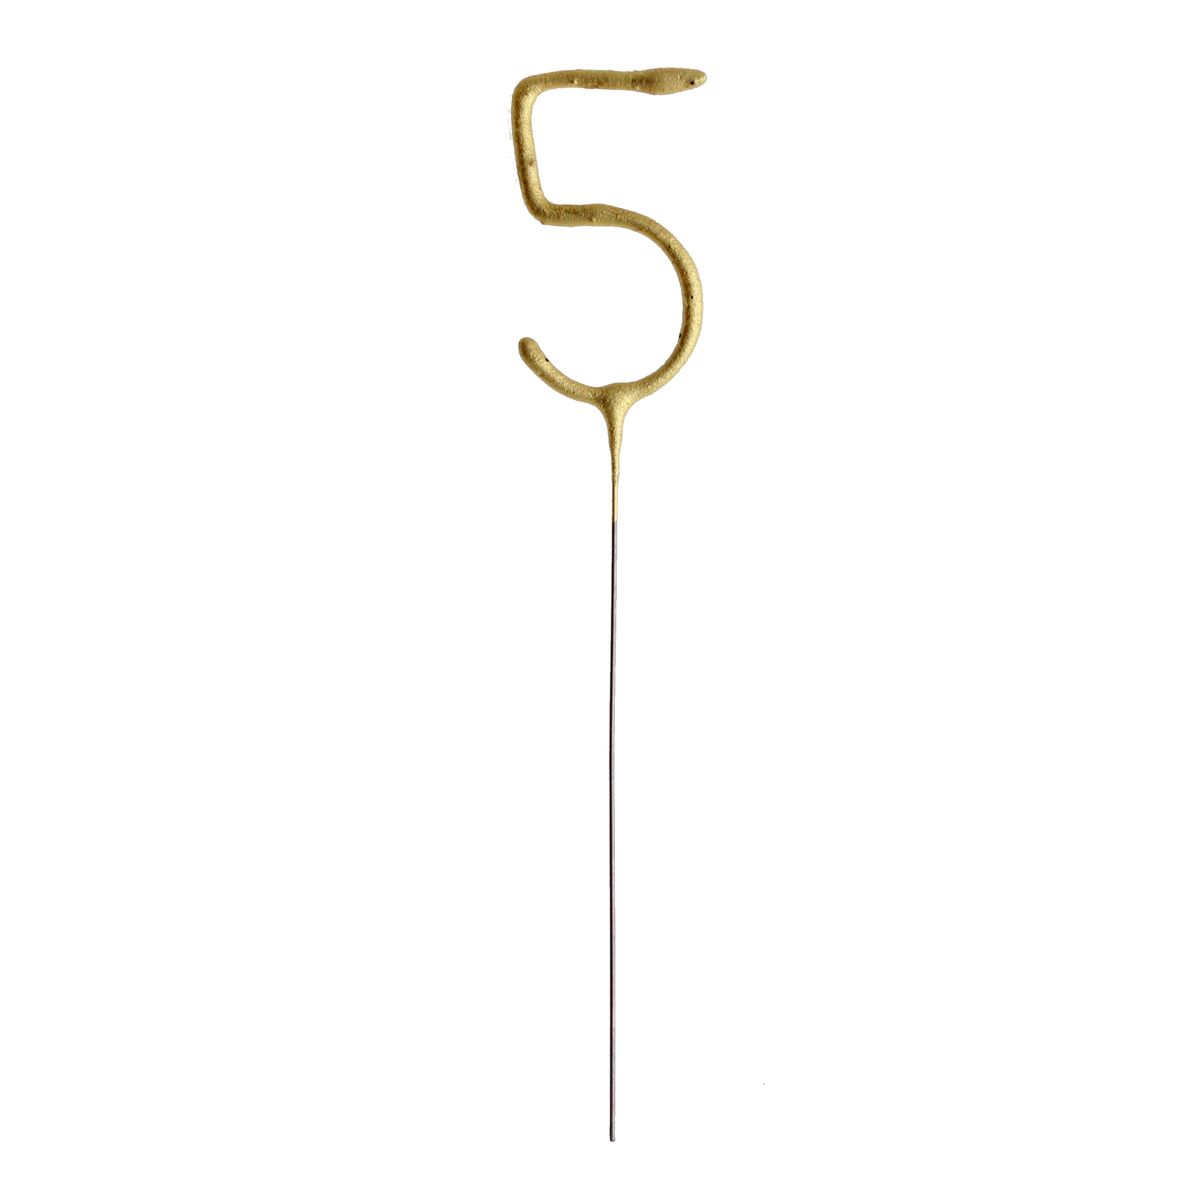 Bougie scintillante dorée chiffre 5 - Patisdecor